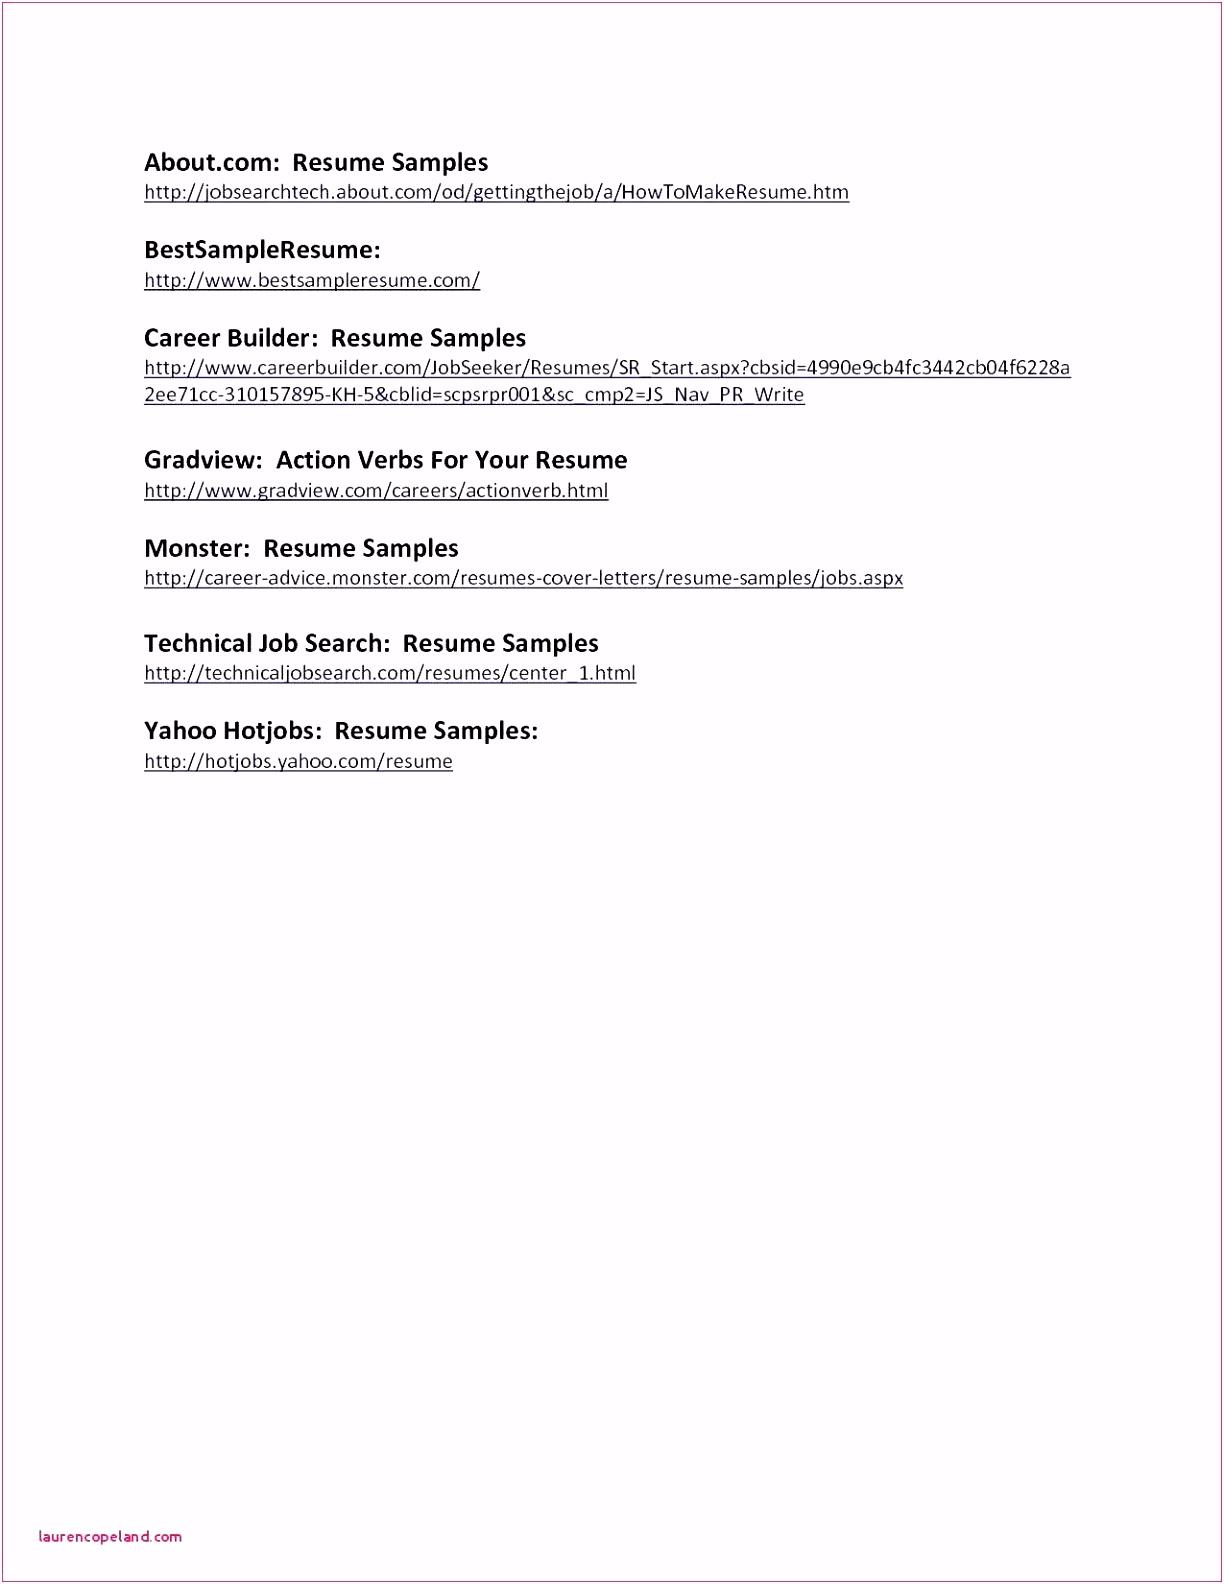 Monatliches Reporting Vorlage Monatliches Reporting Vorlage 55 Excel Vorlagen Controlling U0qq54ngq5 Qmoh2mhap5